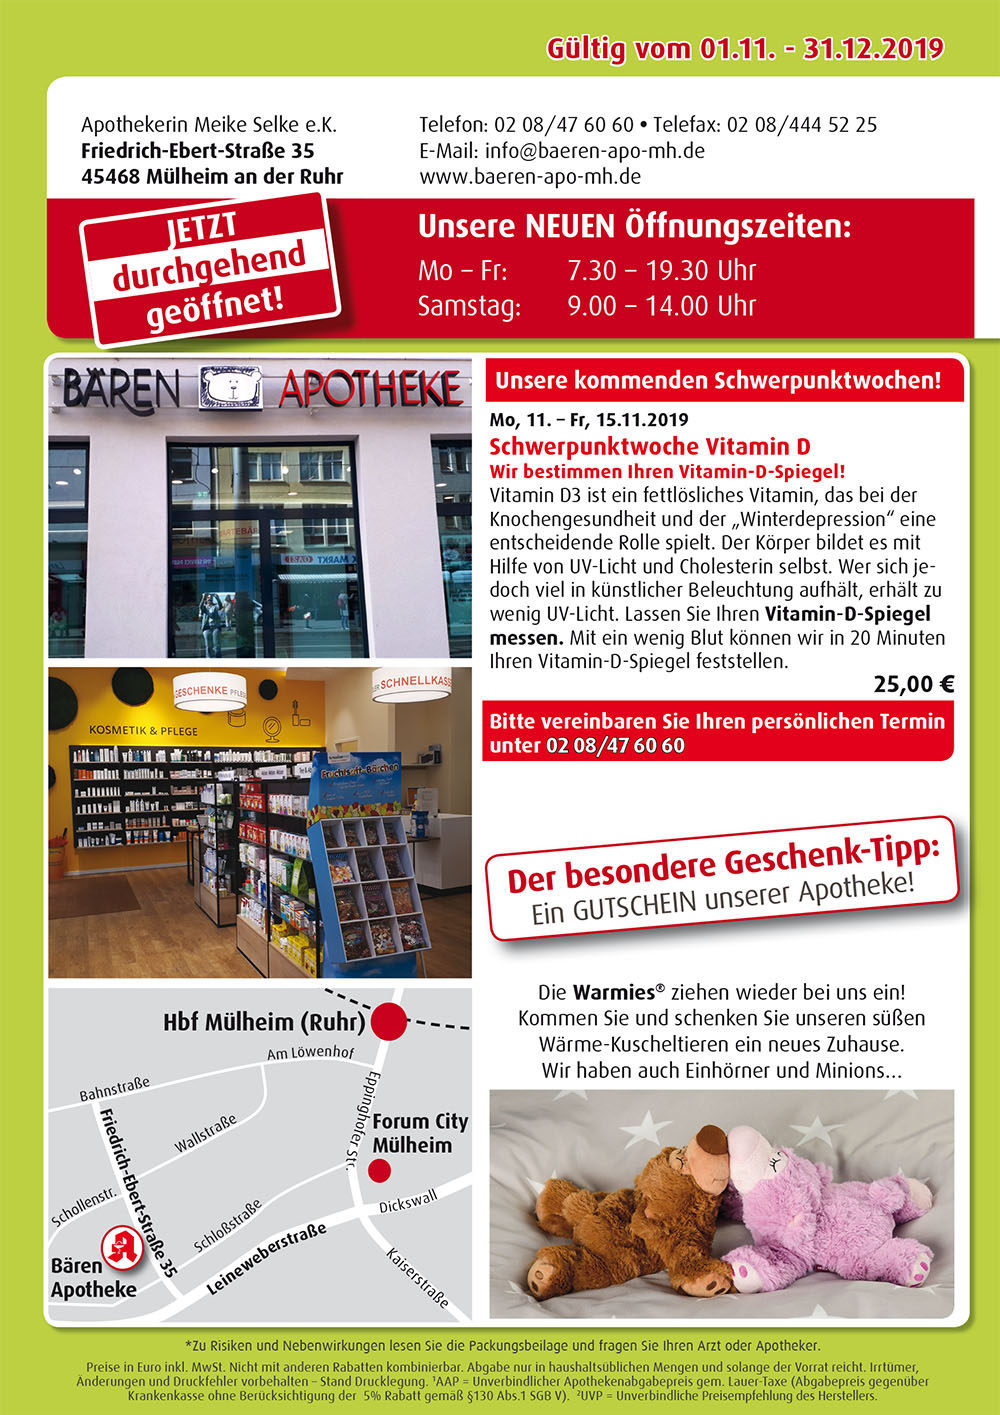 https://www-apotheken-de.apocdn.net/fileadmin/clubarea/00000-Angebote/45468_9082_baeren_angebot_3.jpg